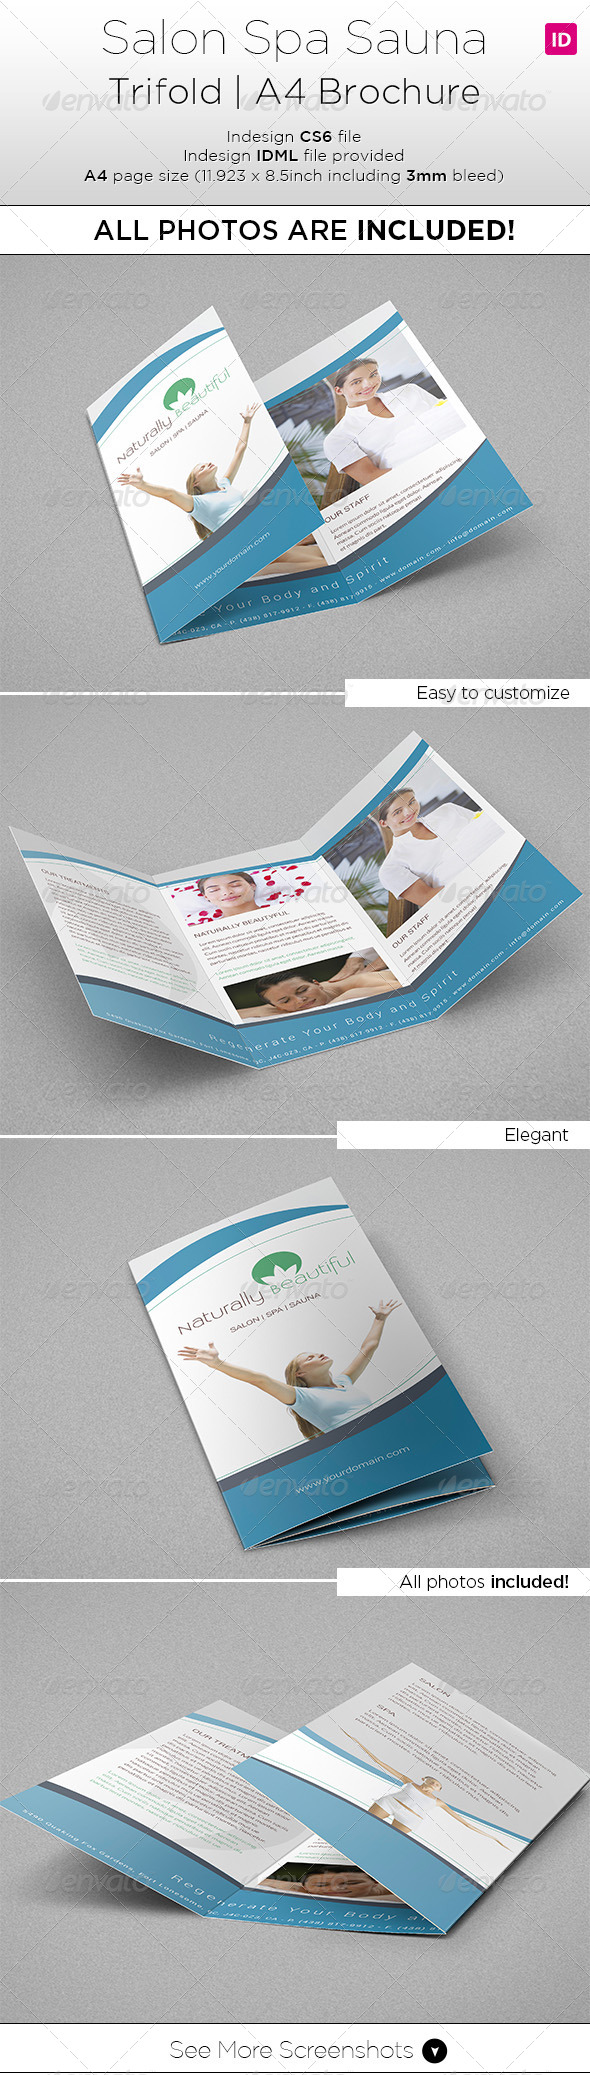 Salon Spa Trifold A4 Brochure All Photo Included